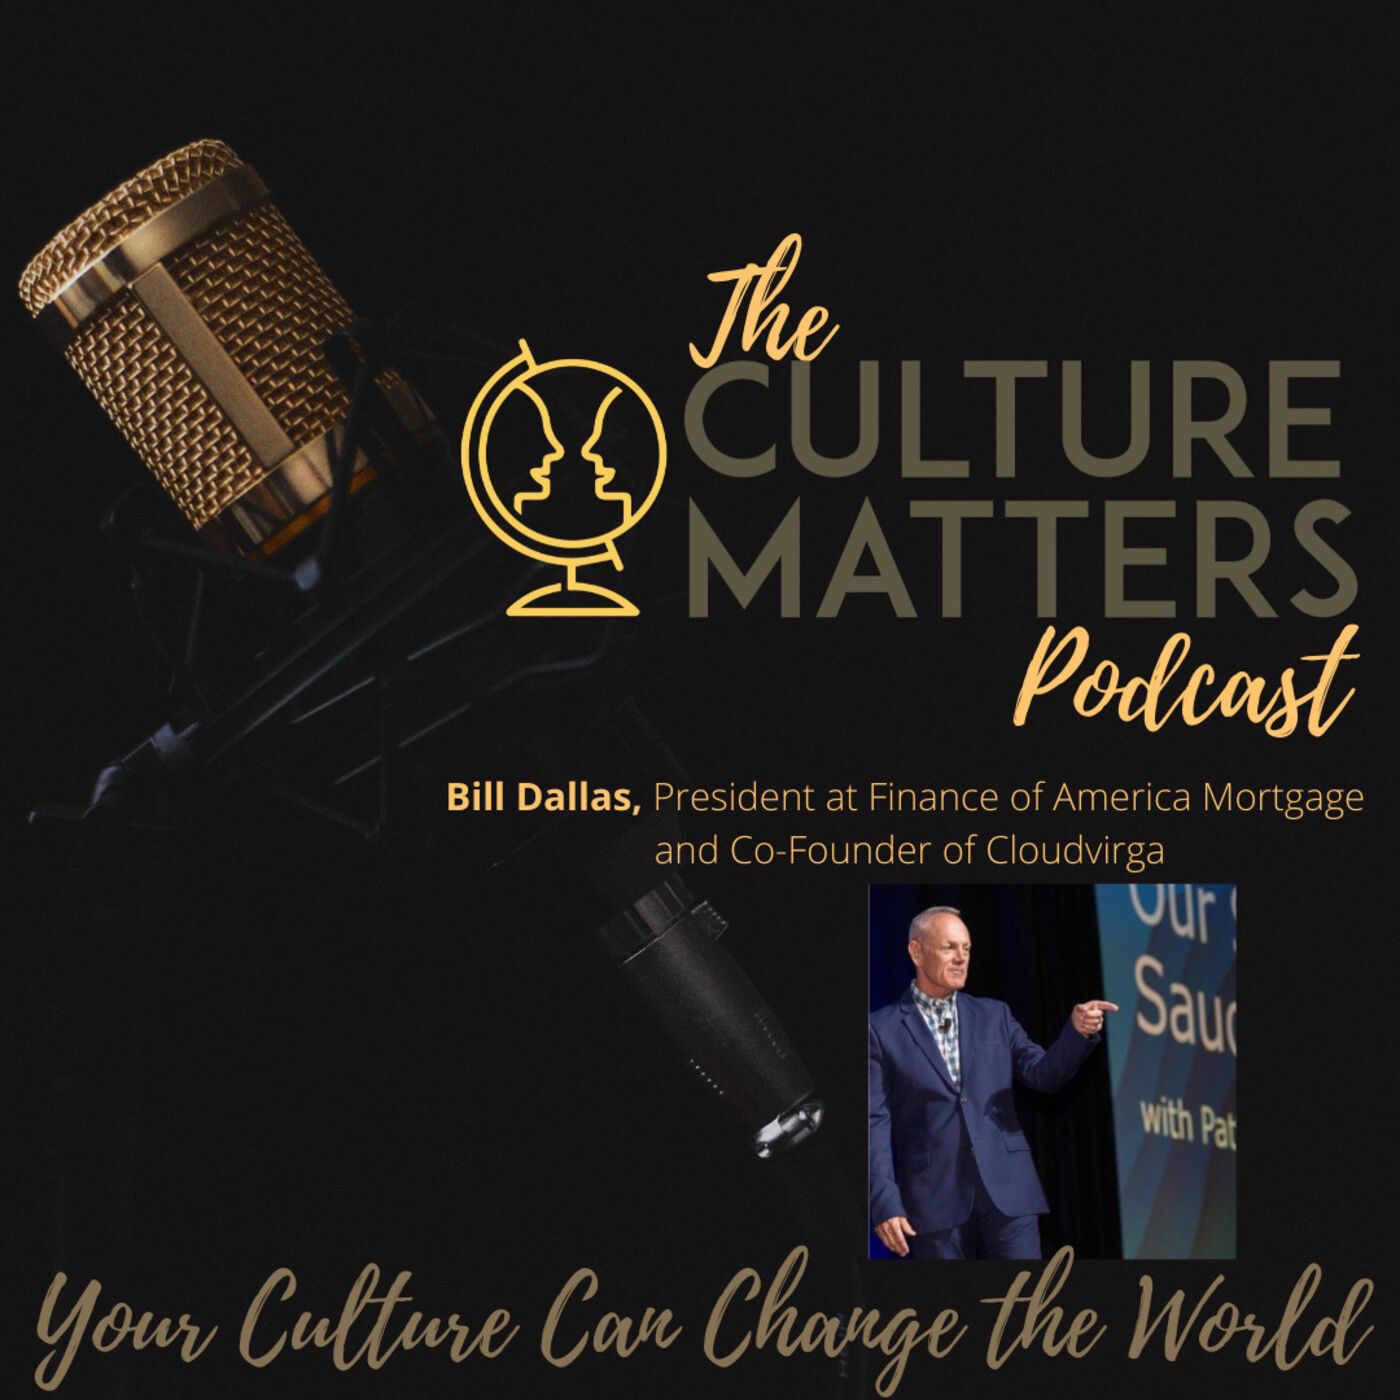 Season 7, Episode 84: Guest: Bill Dallas: How to Build Wealth